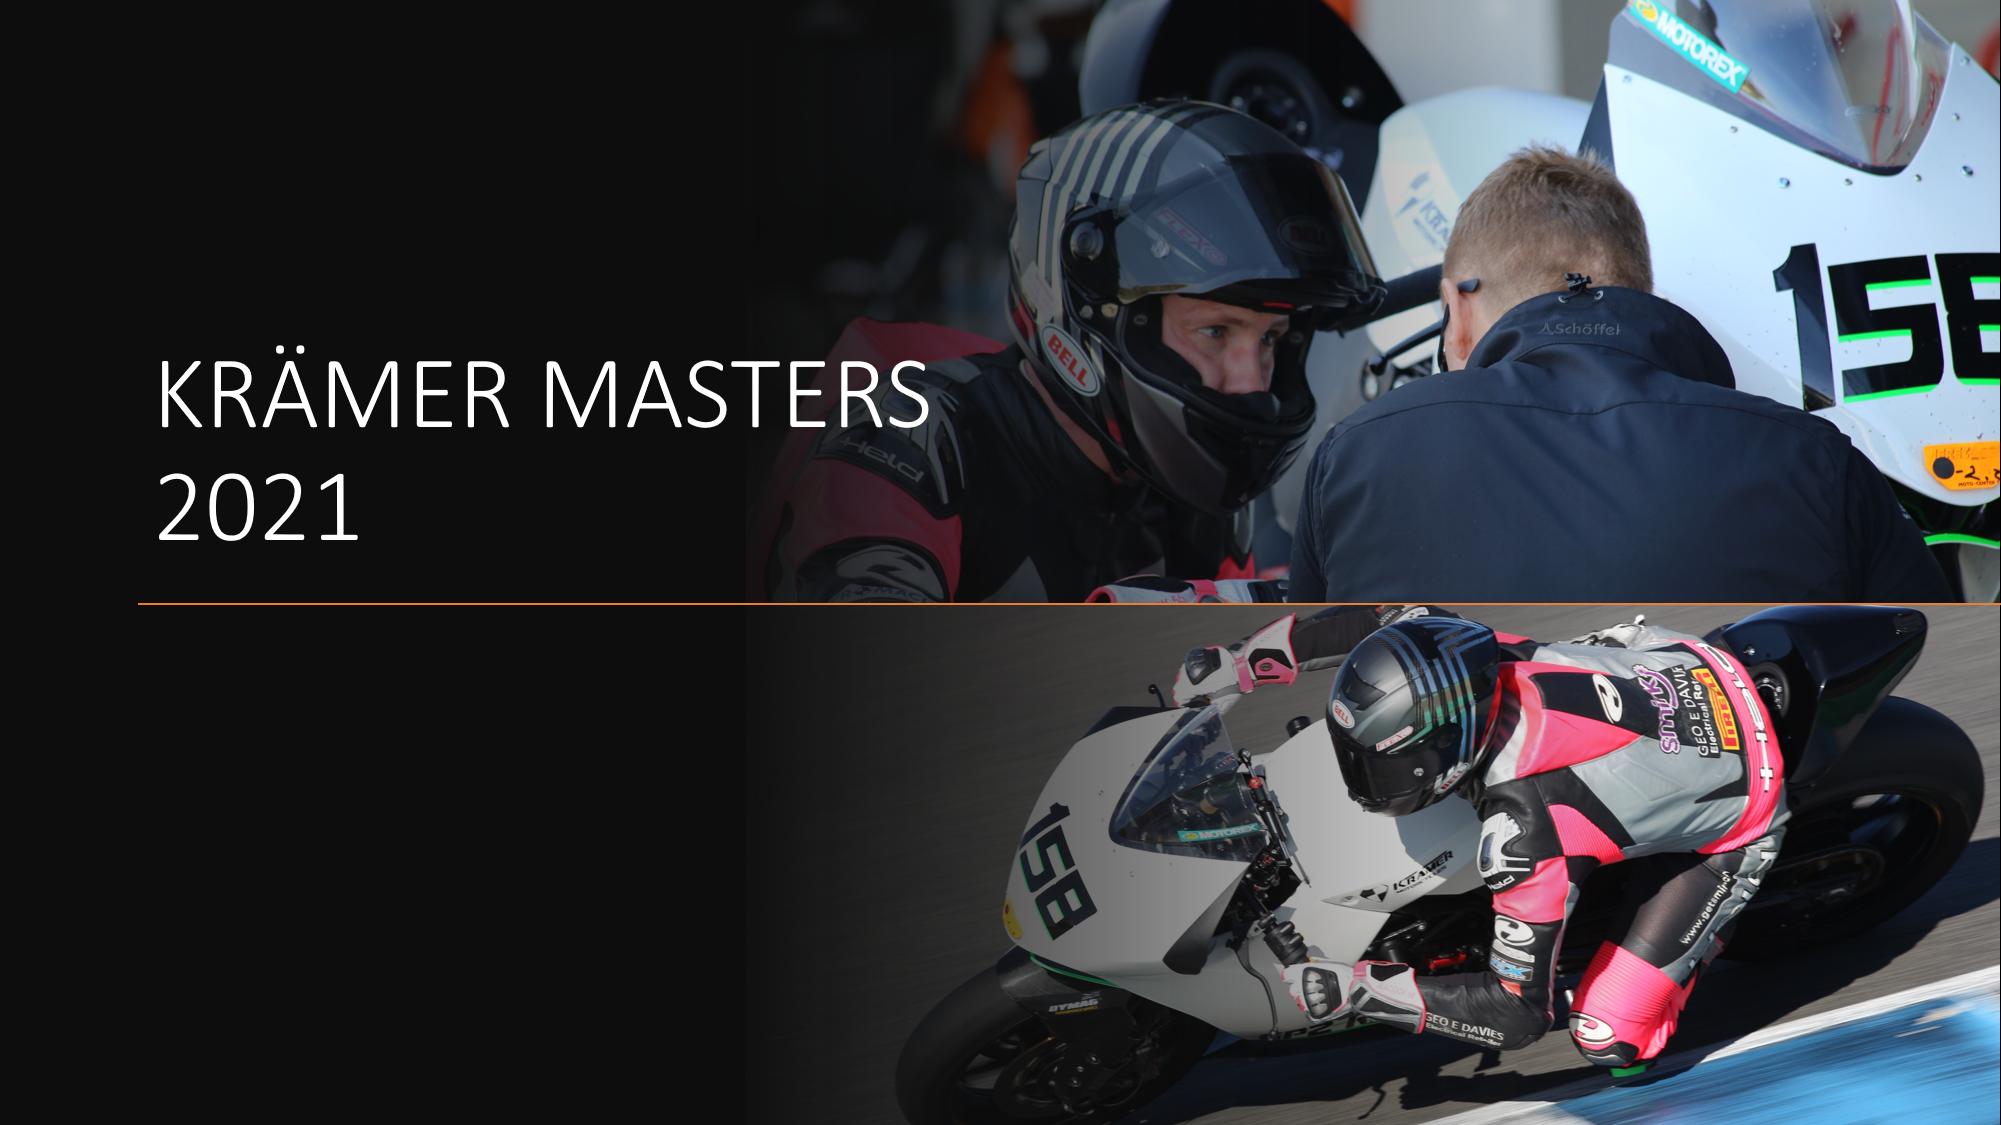 Krämer Masters